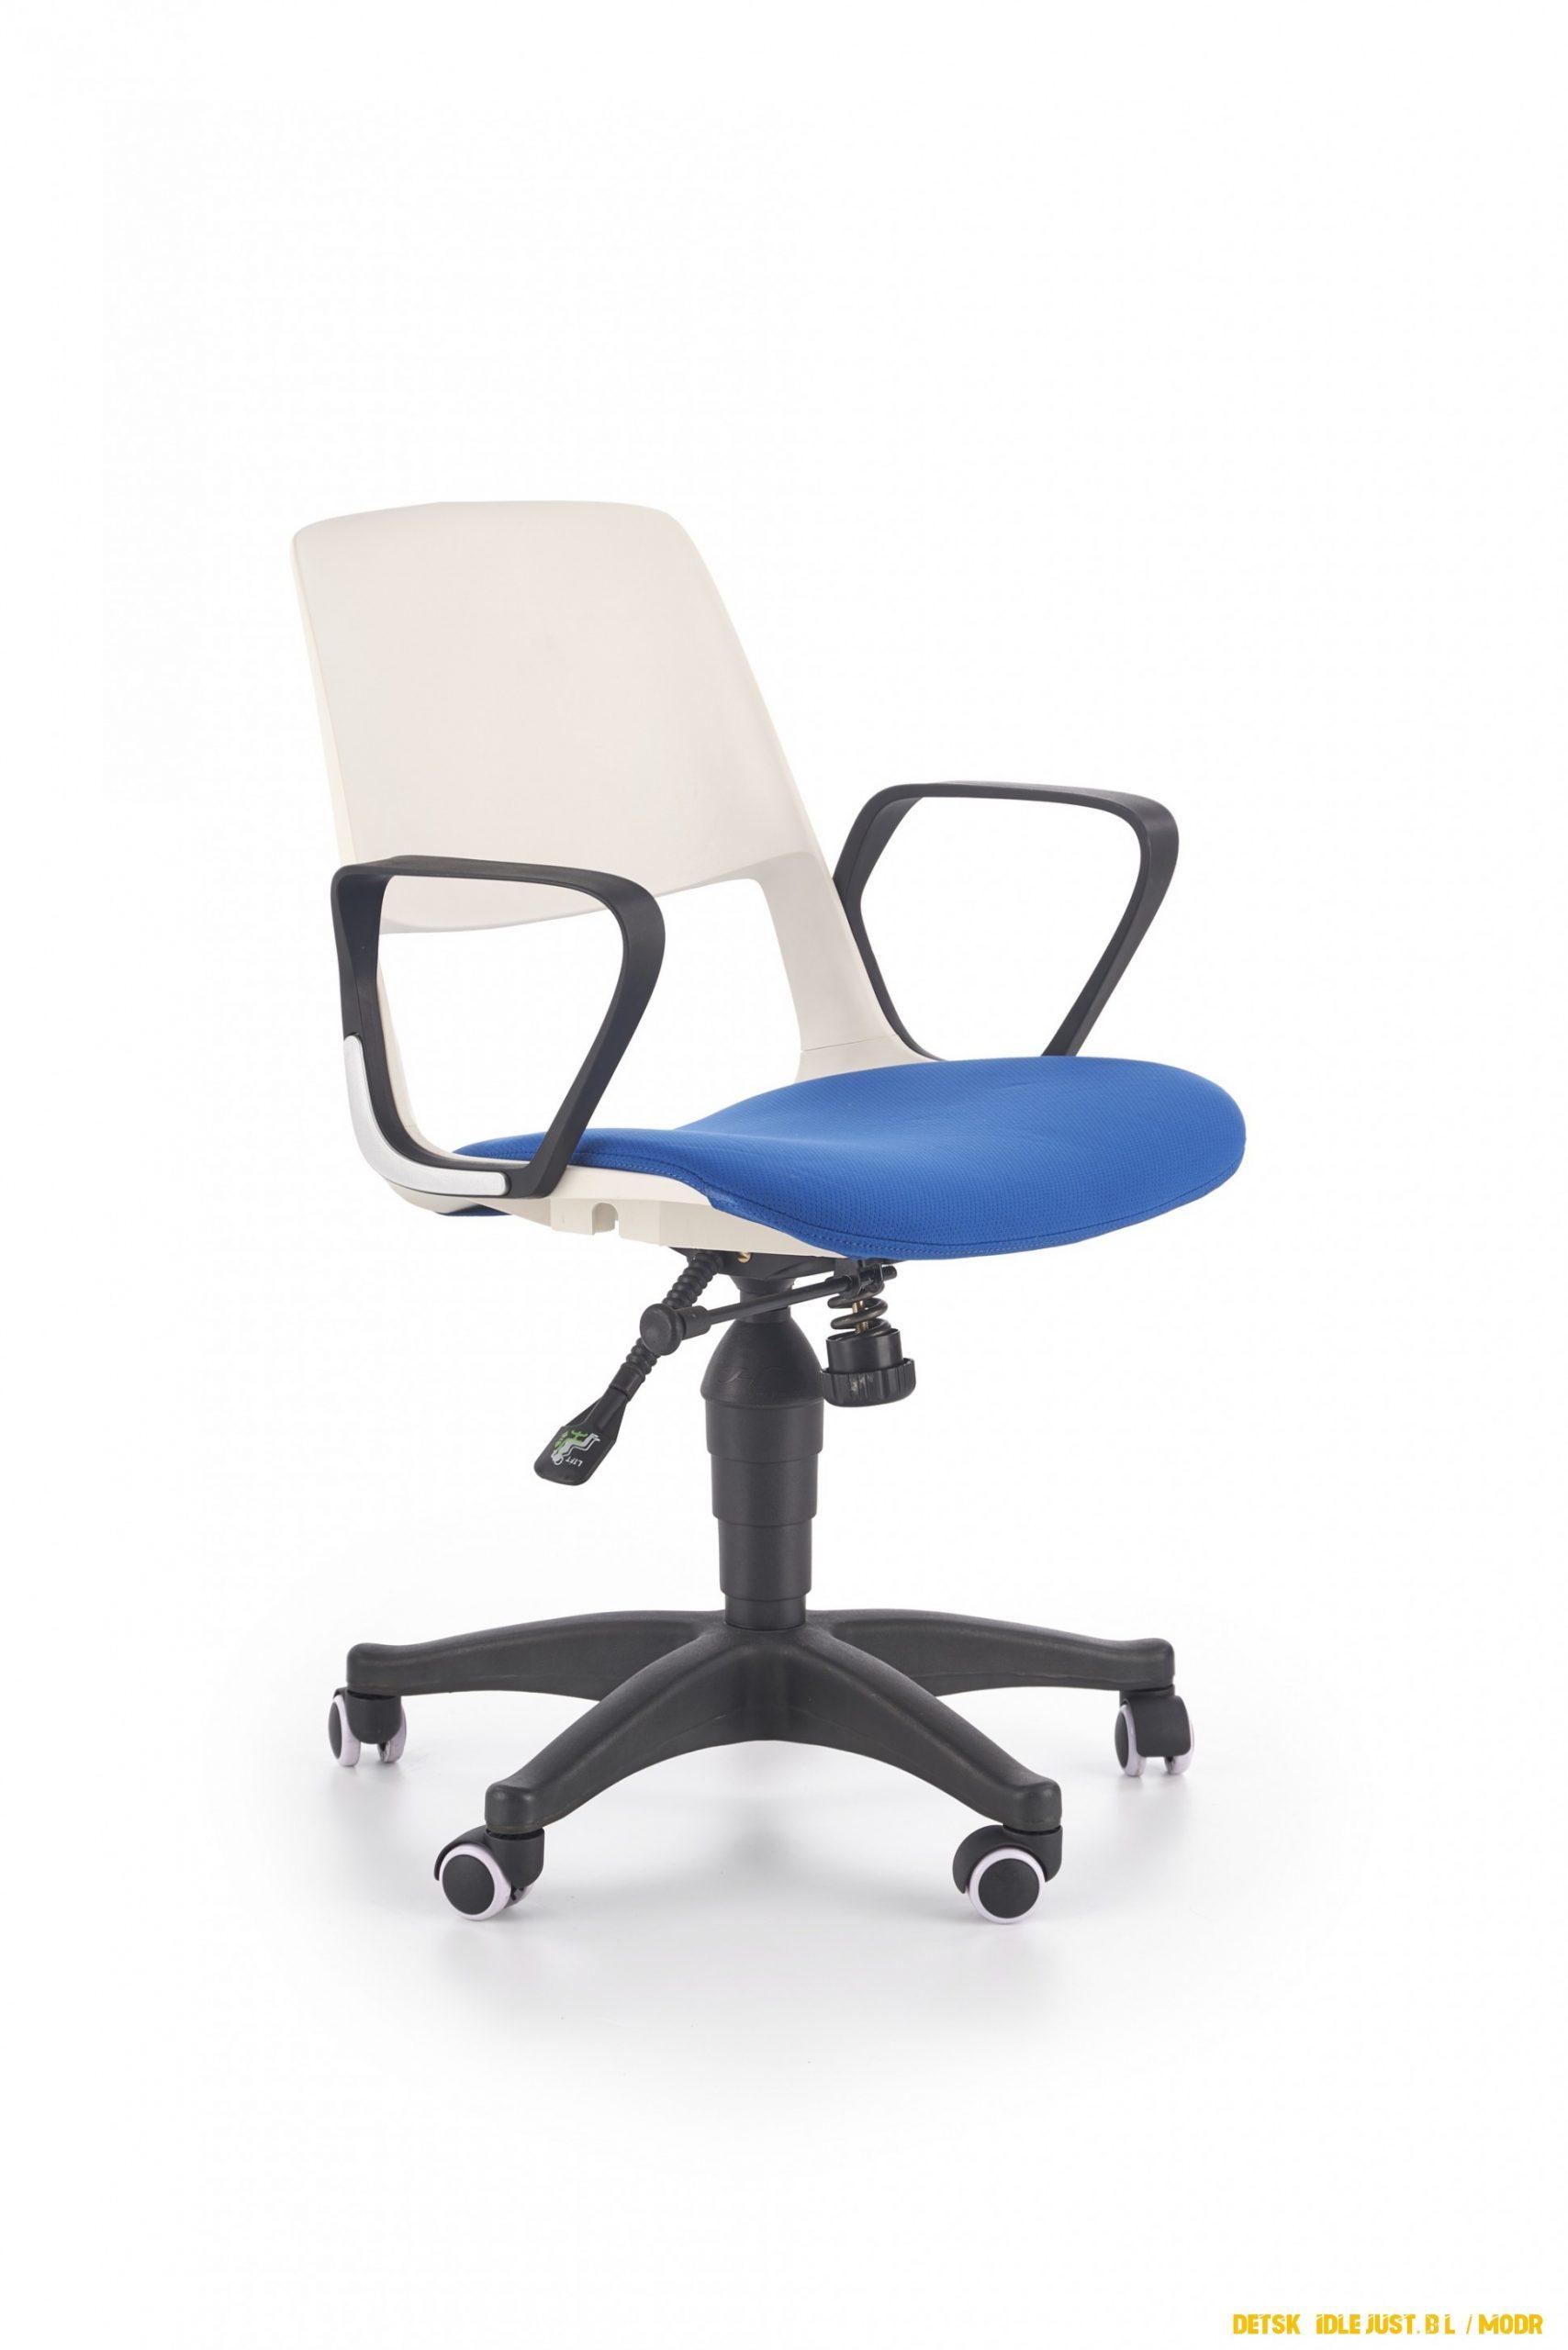 Dětská židle Just, bílá / modrá